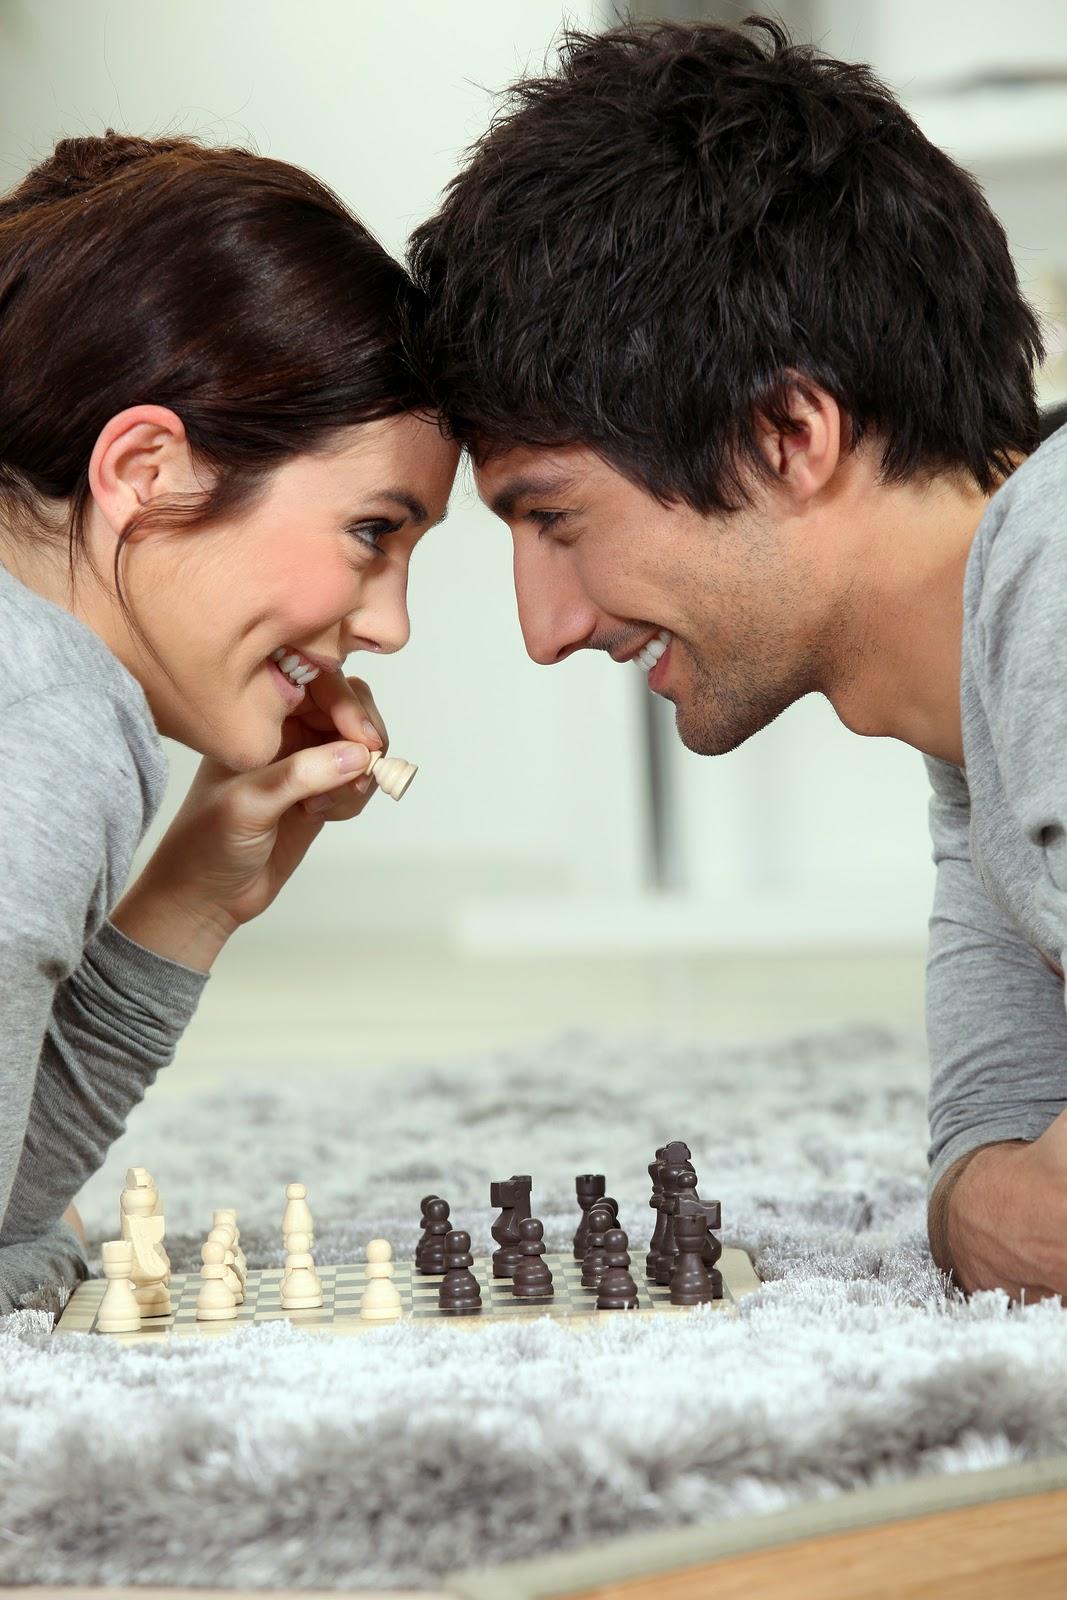 http://19twentythree.com/wp-content/uploads/2013/06/Auremar-bigstock-Couple-playing-chess-38954293.jpg